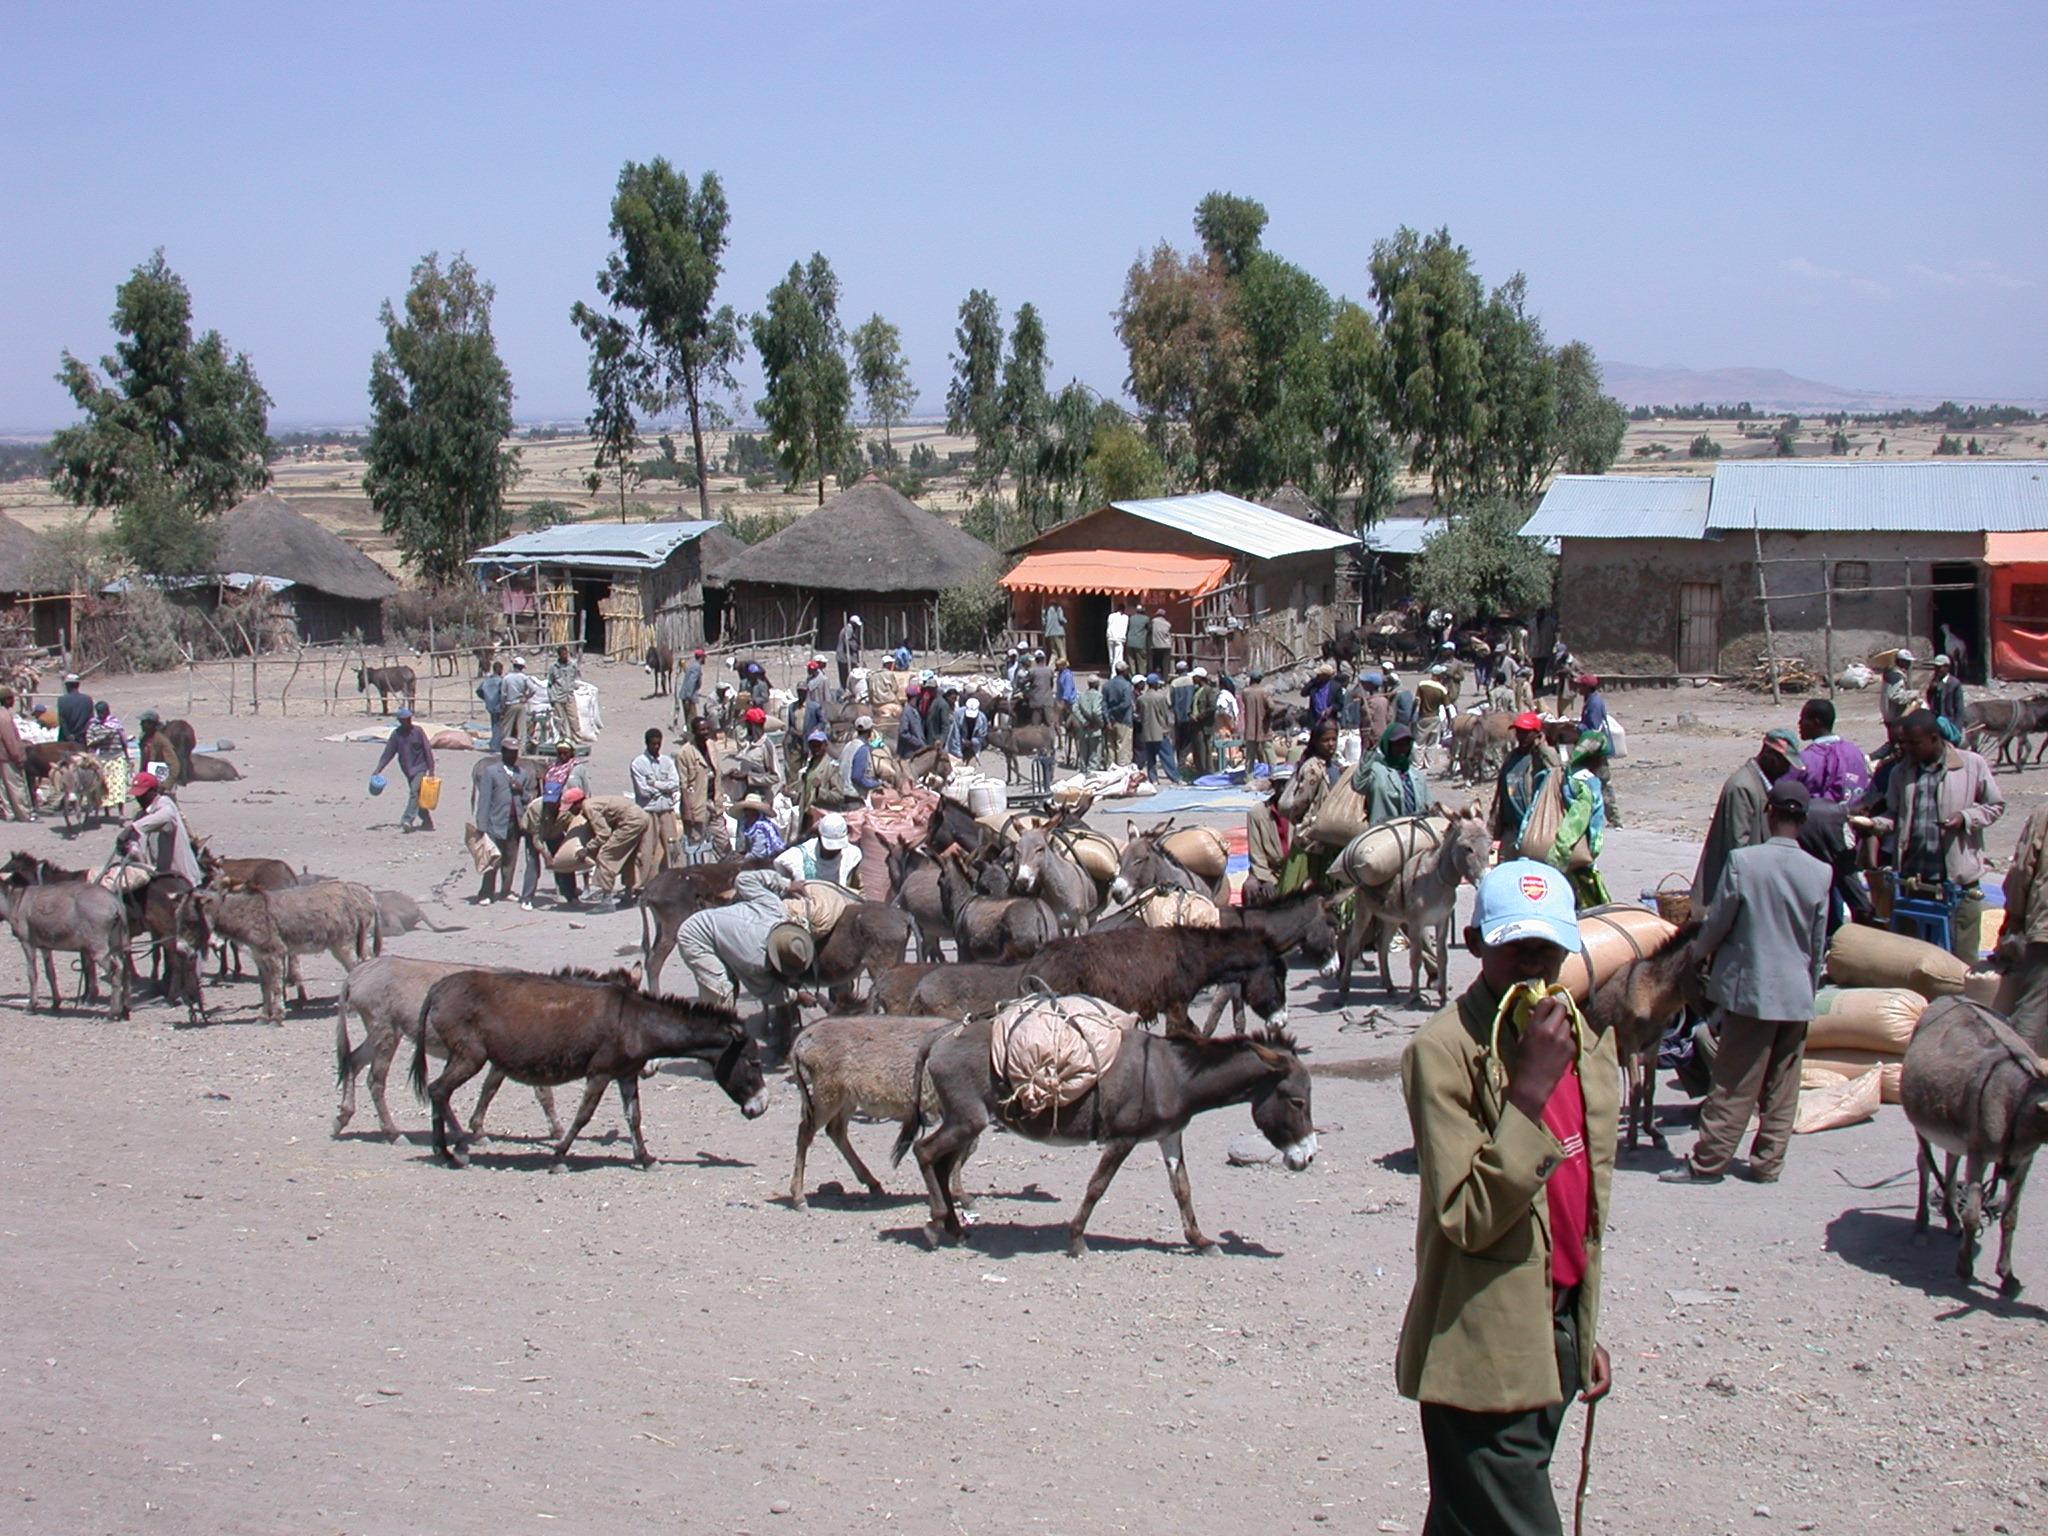 Marketplace Between Melka Kunture and Adadi Mariam Church, South of Addis Ababa, Ethiopia